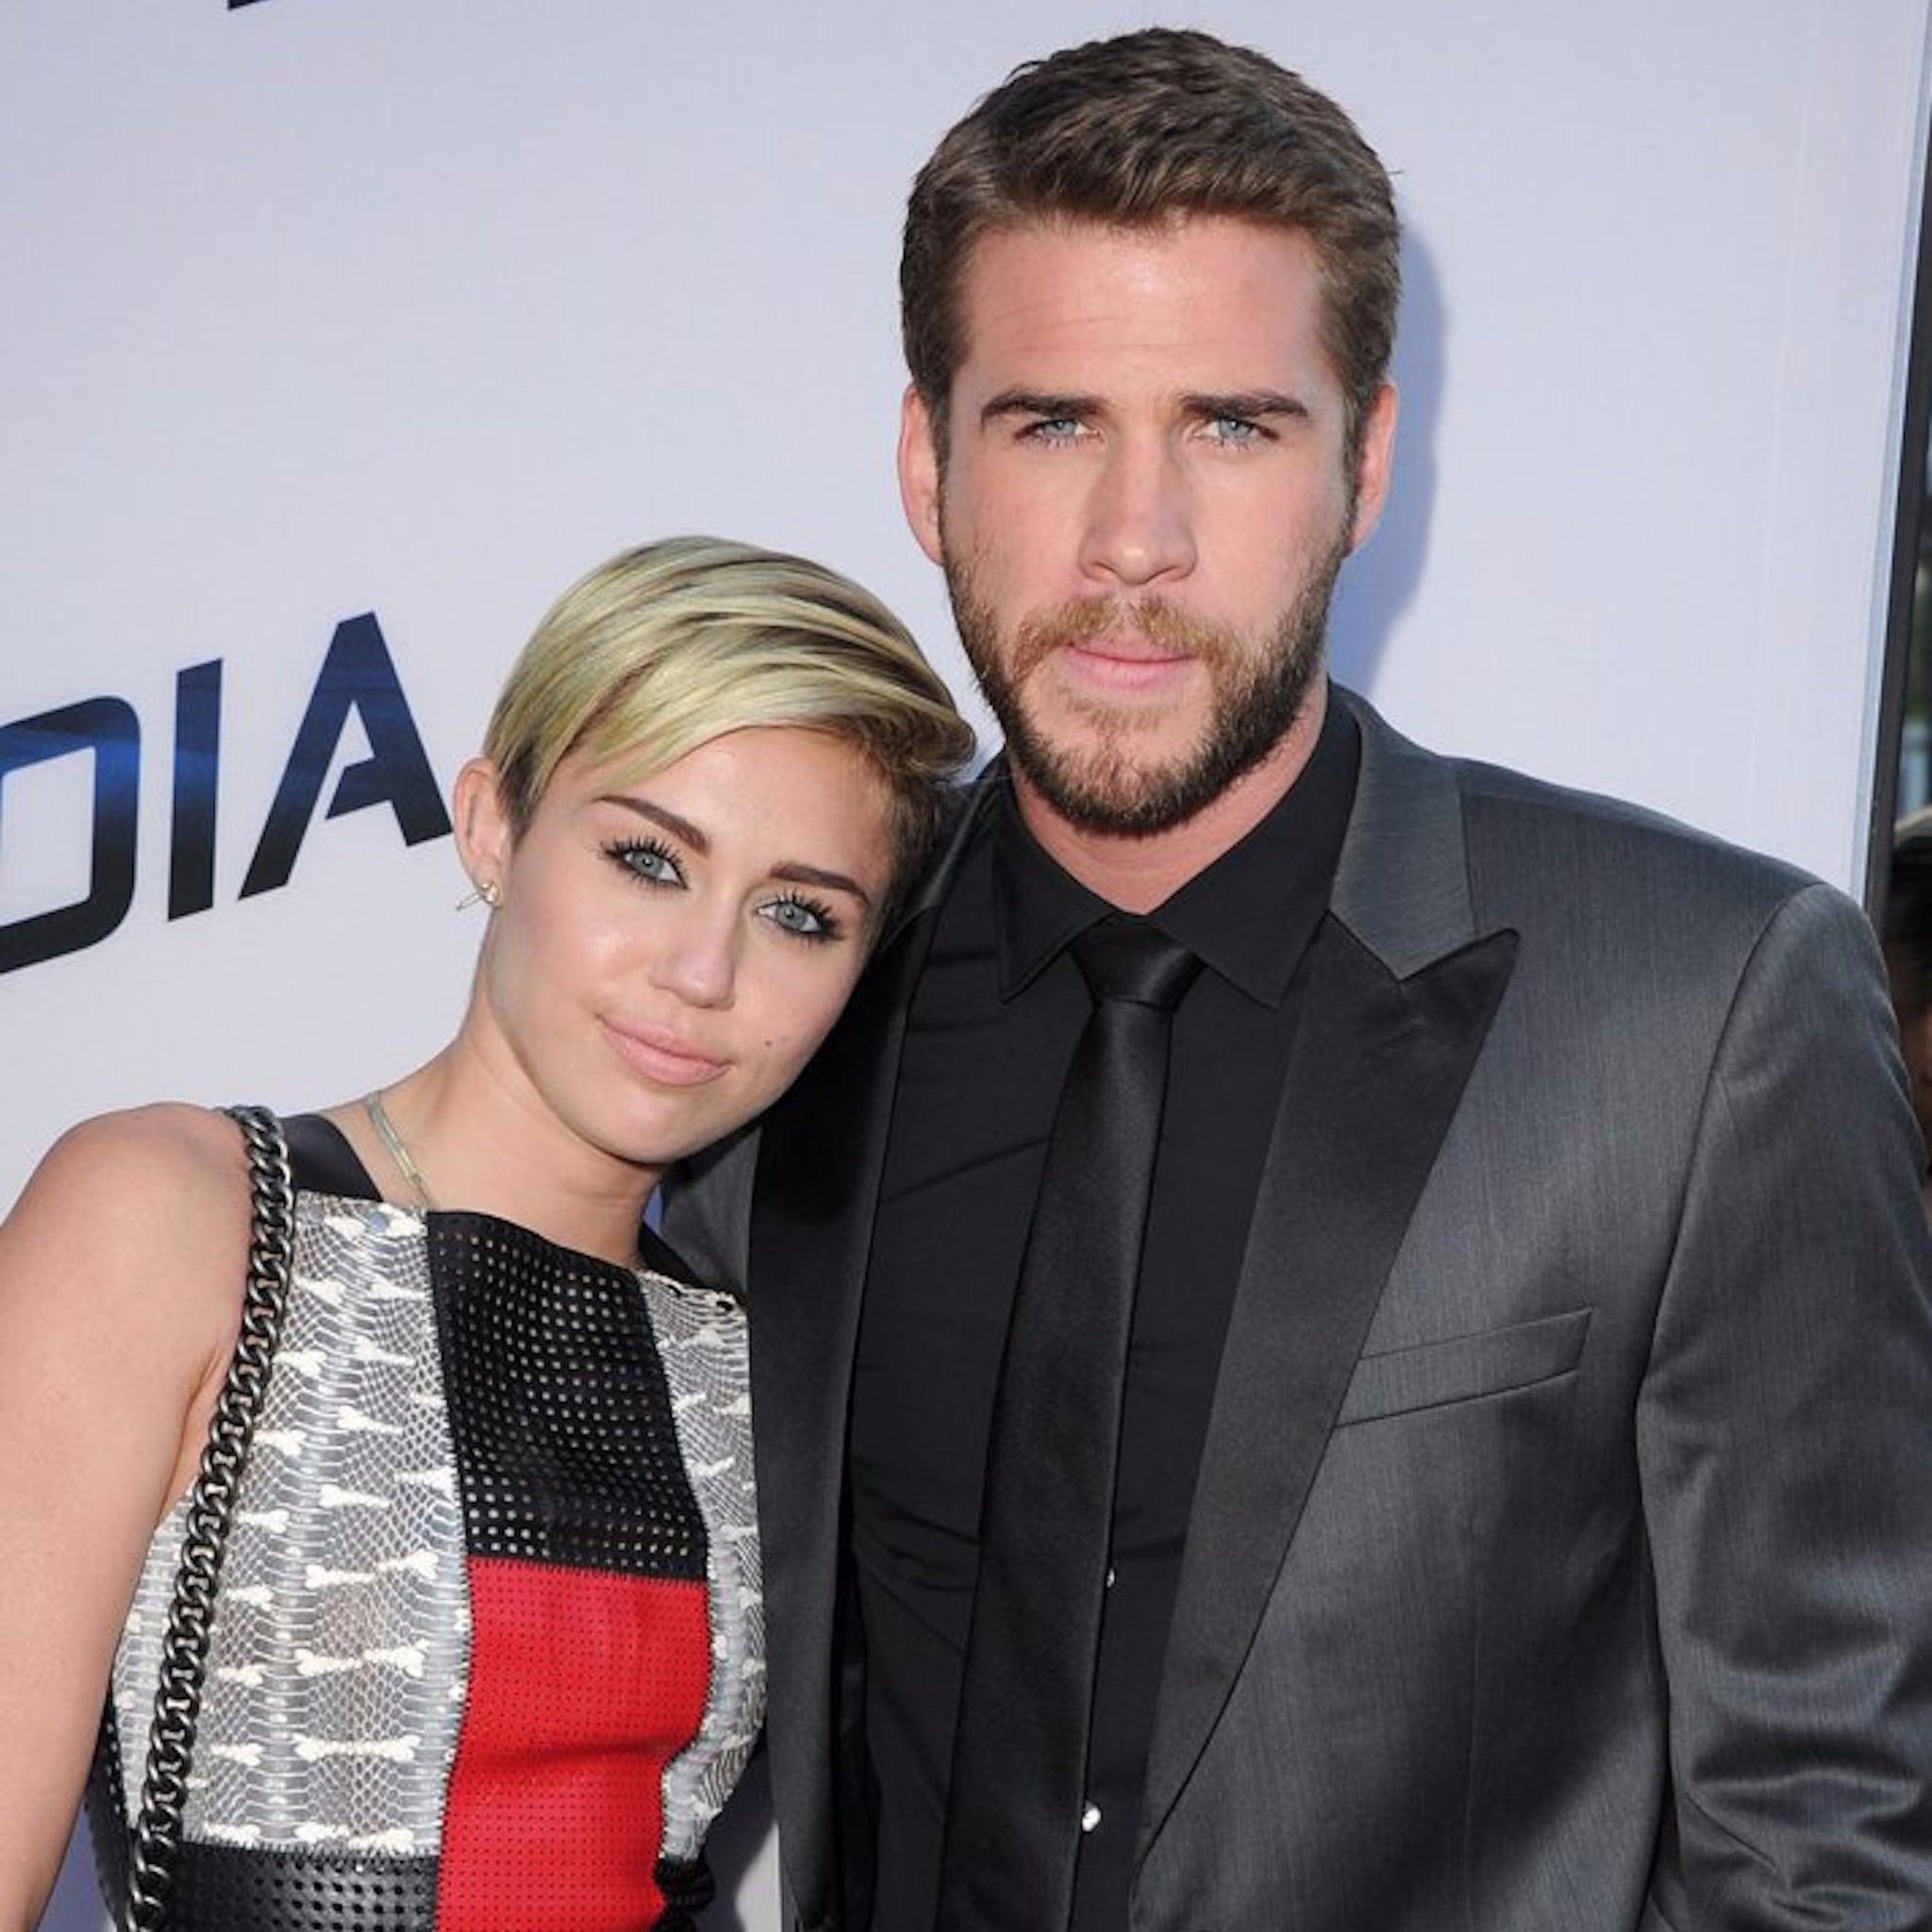 New Celebrity Couples POPSUGAR Celebrity - 10 coolest celebrity power couples